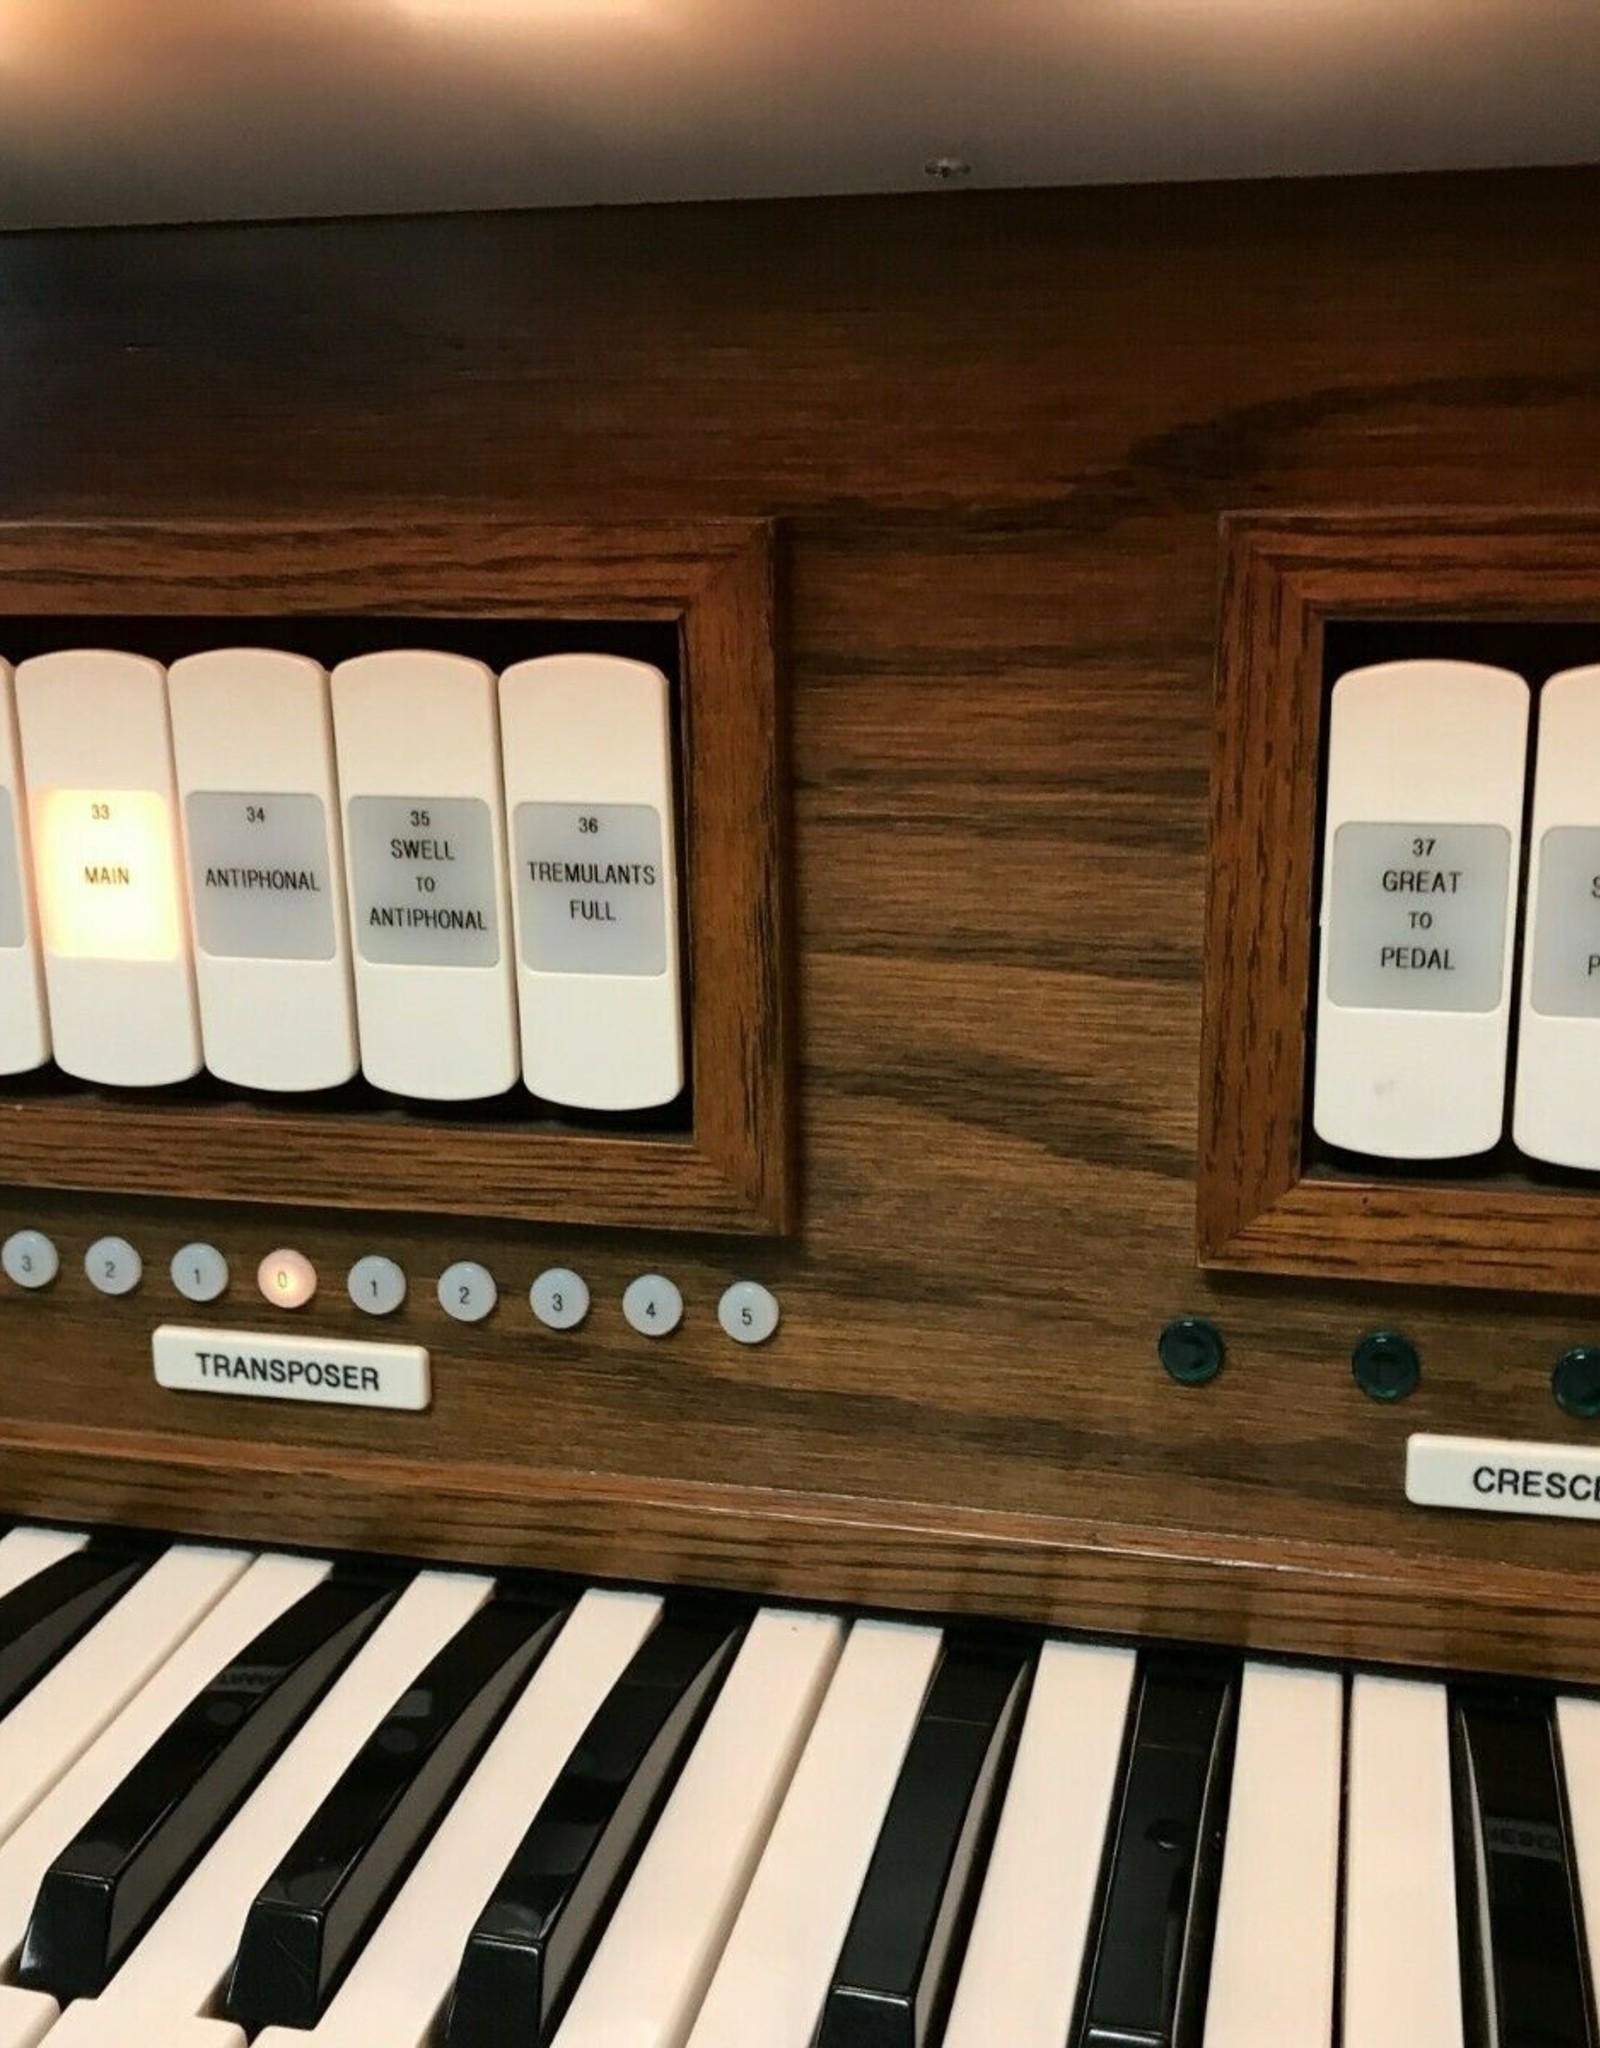 Baldwin Baldwin D-422 Digital Organ